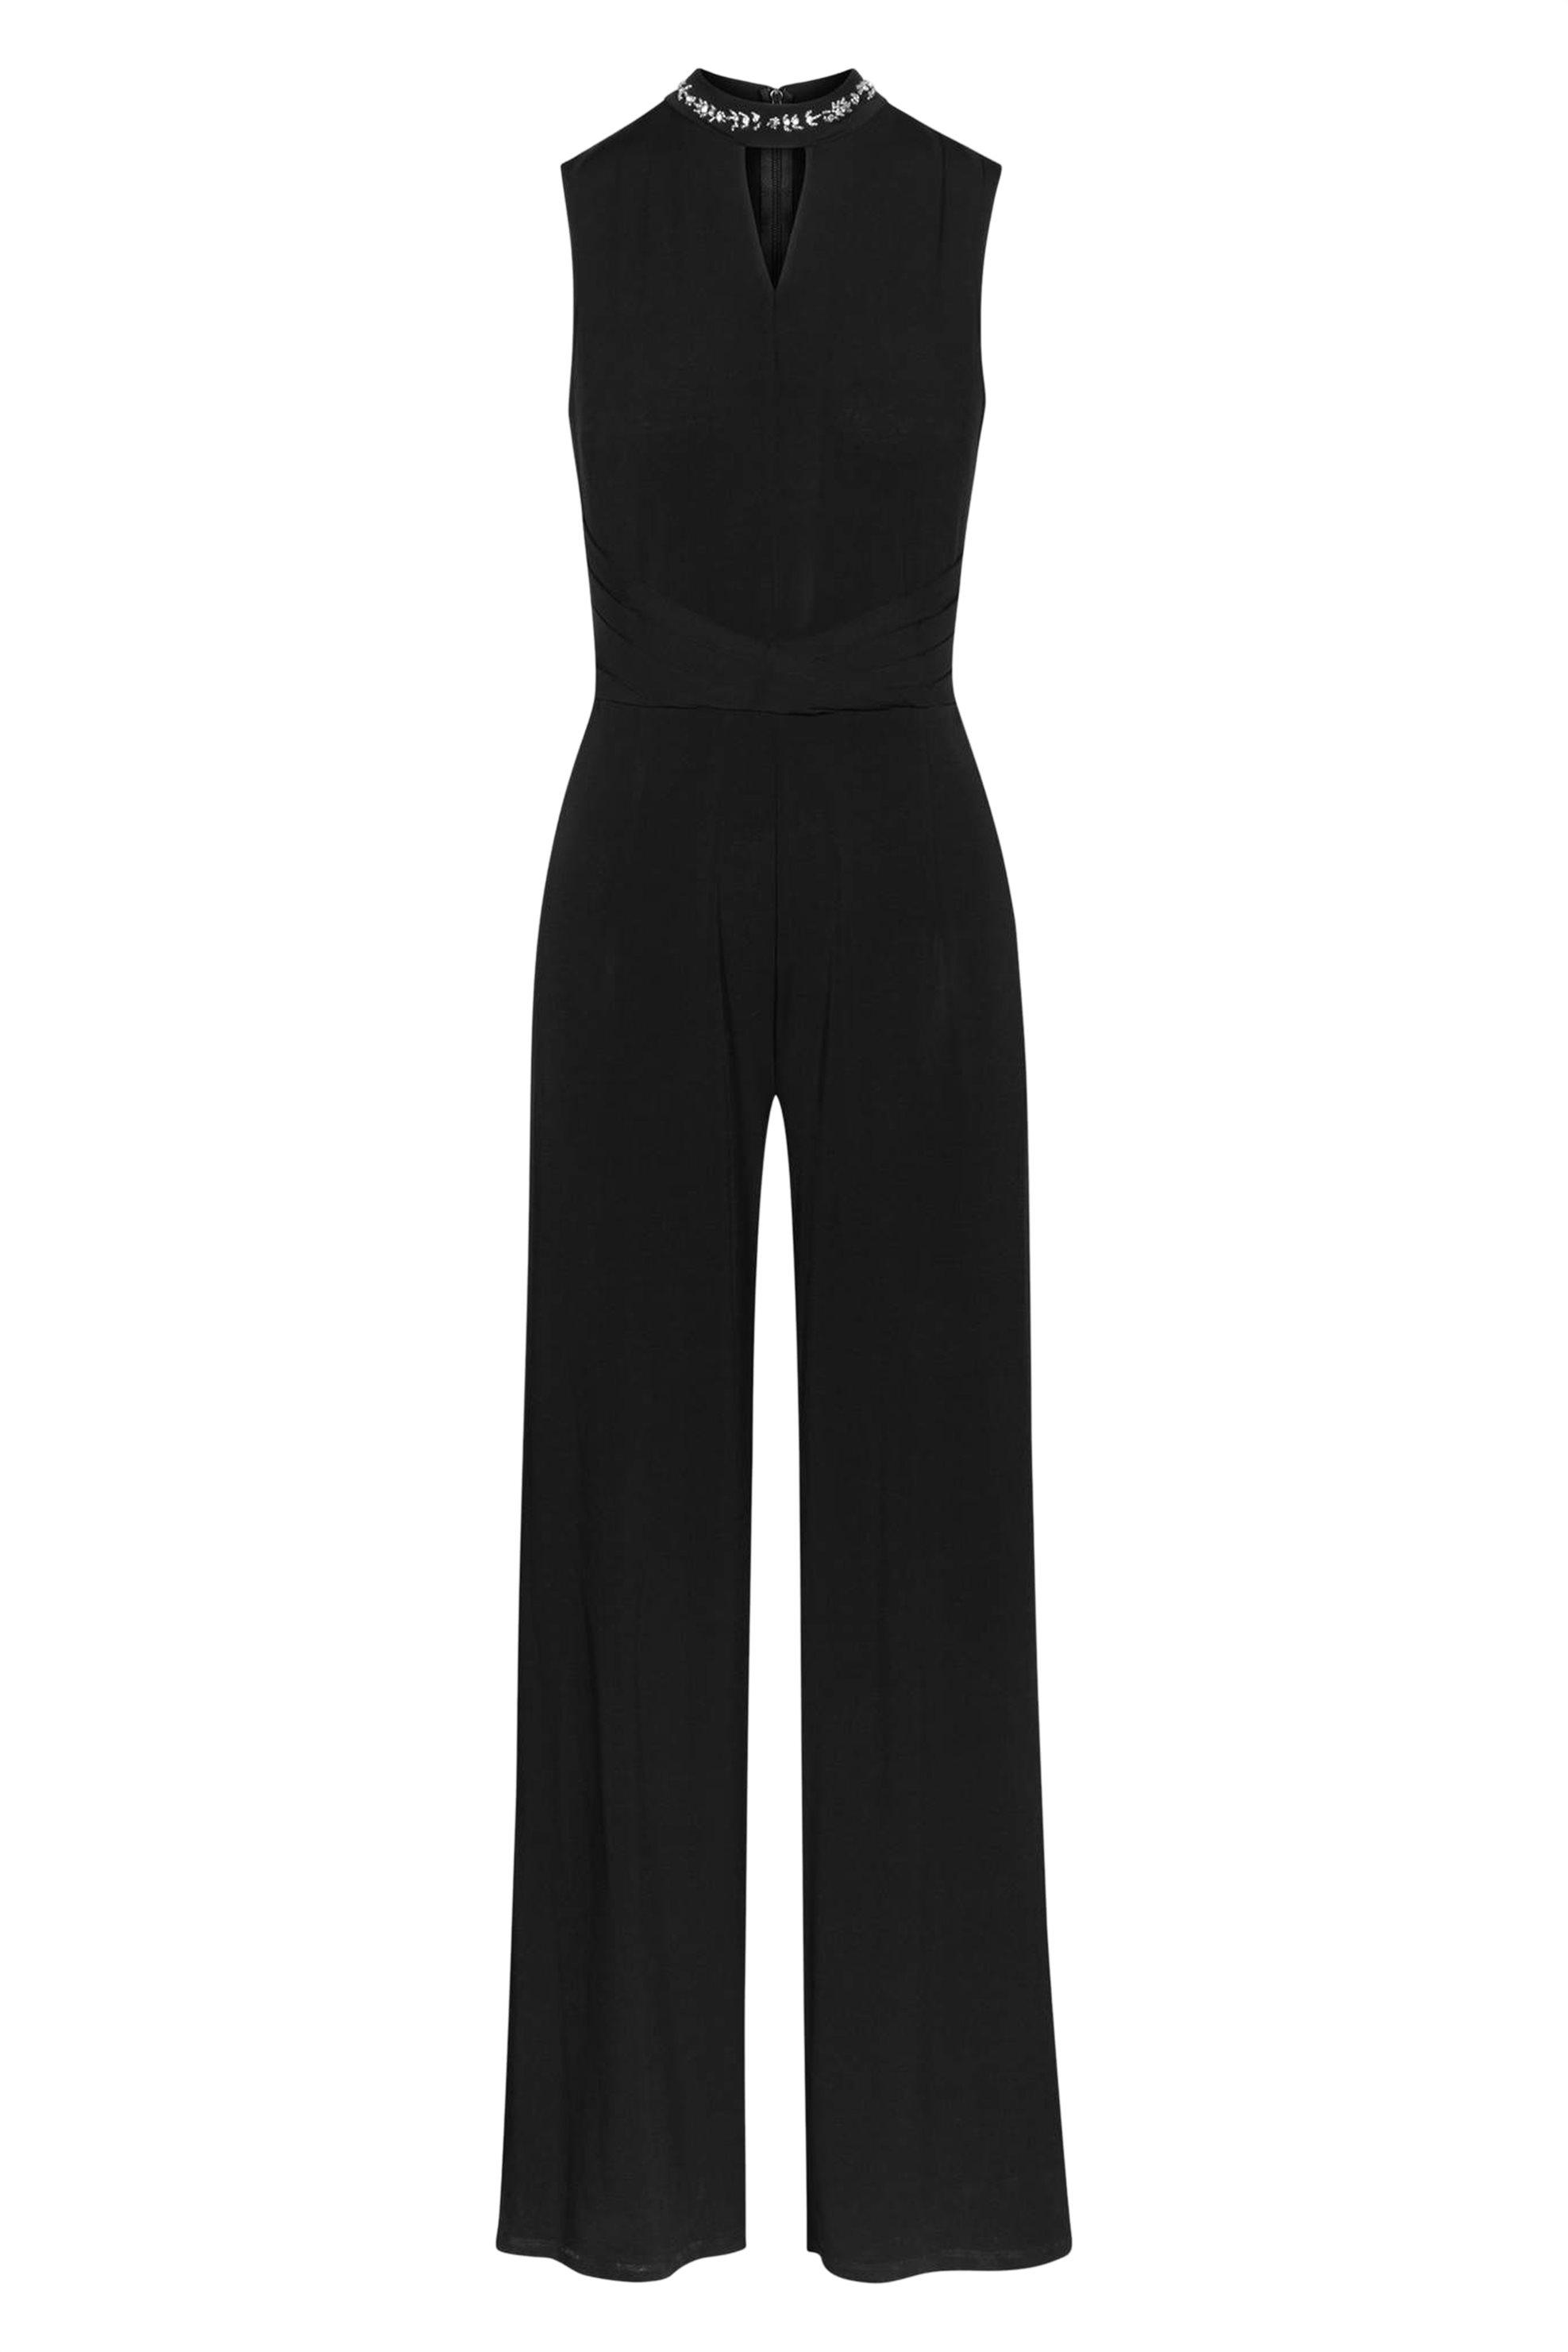 Orsay γυναικεία ολόσωμη φόρμα με κέντημα - 455005-660000 - Μαύρο γυναικα   ρουχα   ολόσωμες φόρμες   σαλοπέτες